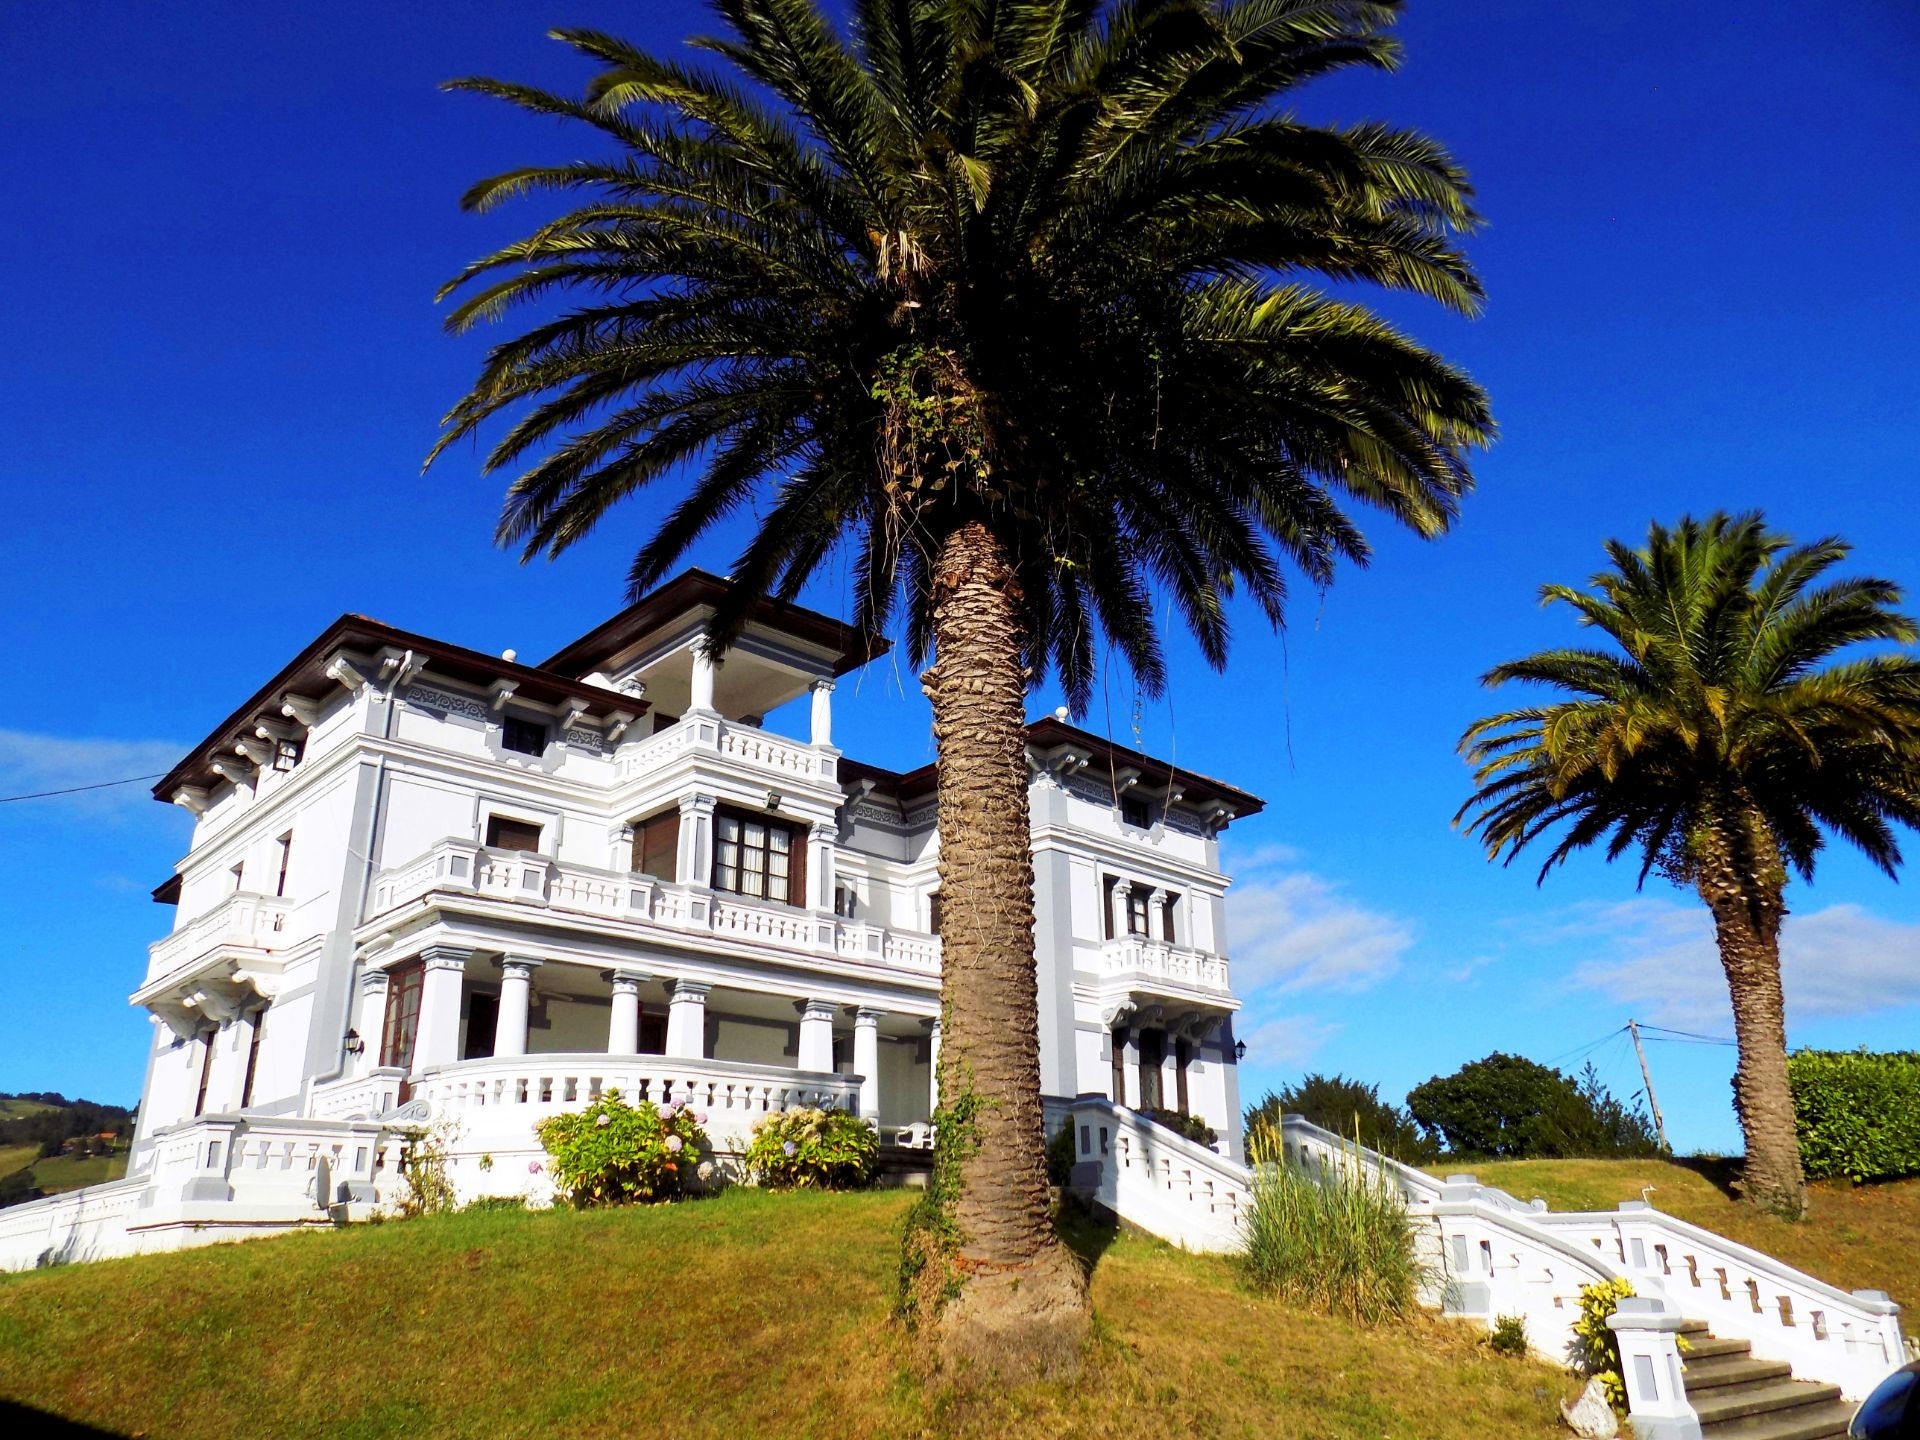 Villa de Lujo en Salas, MALLEZA, venta